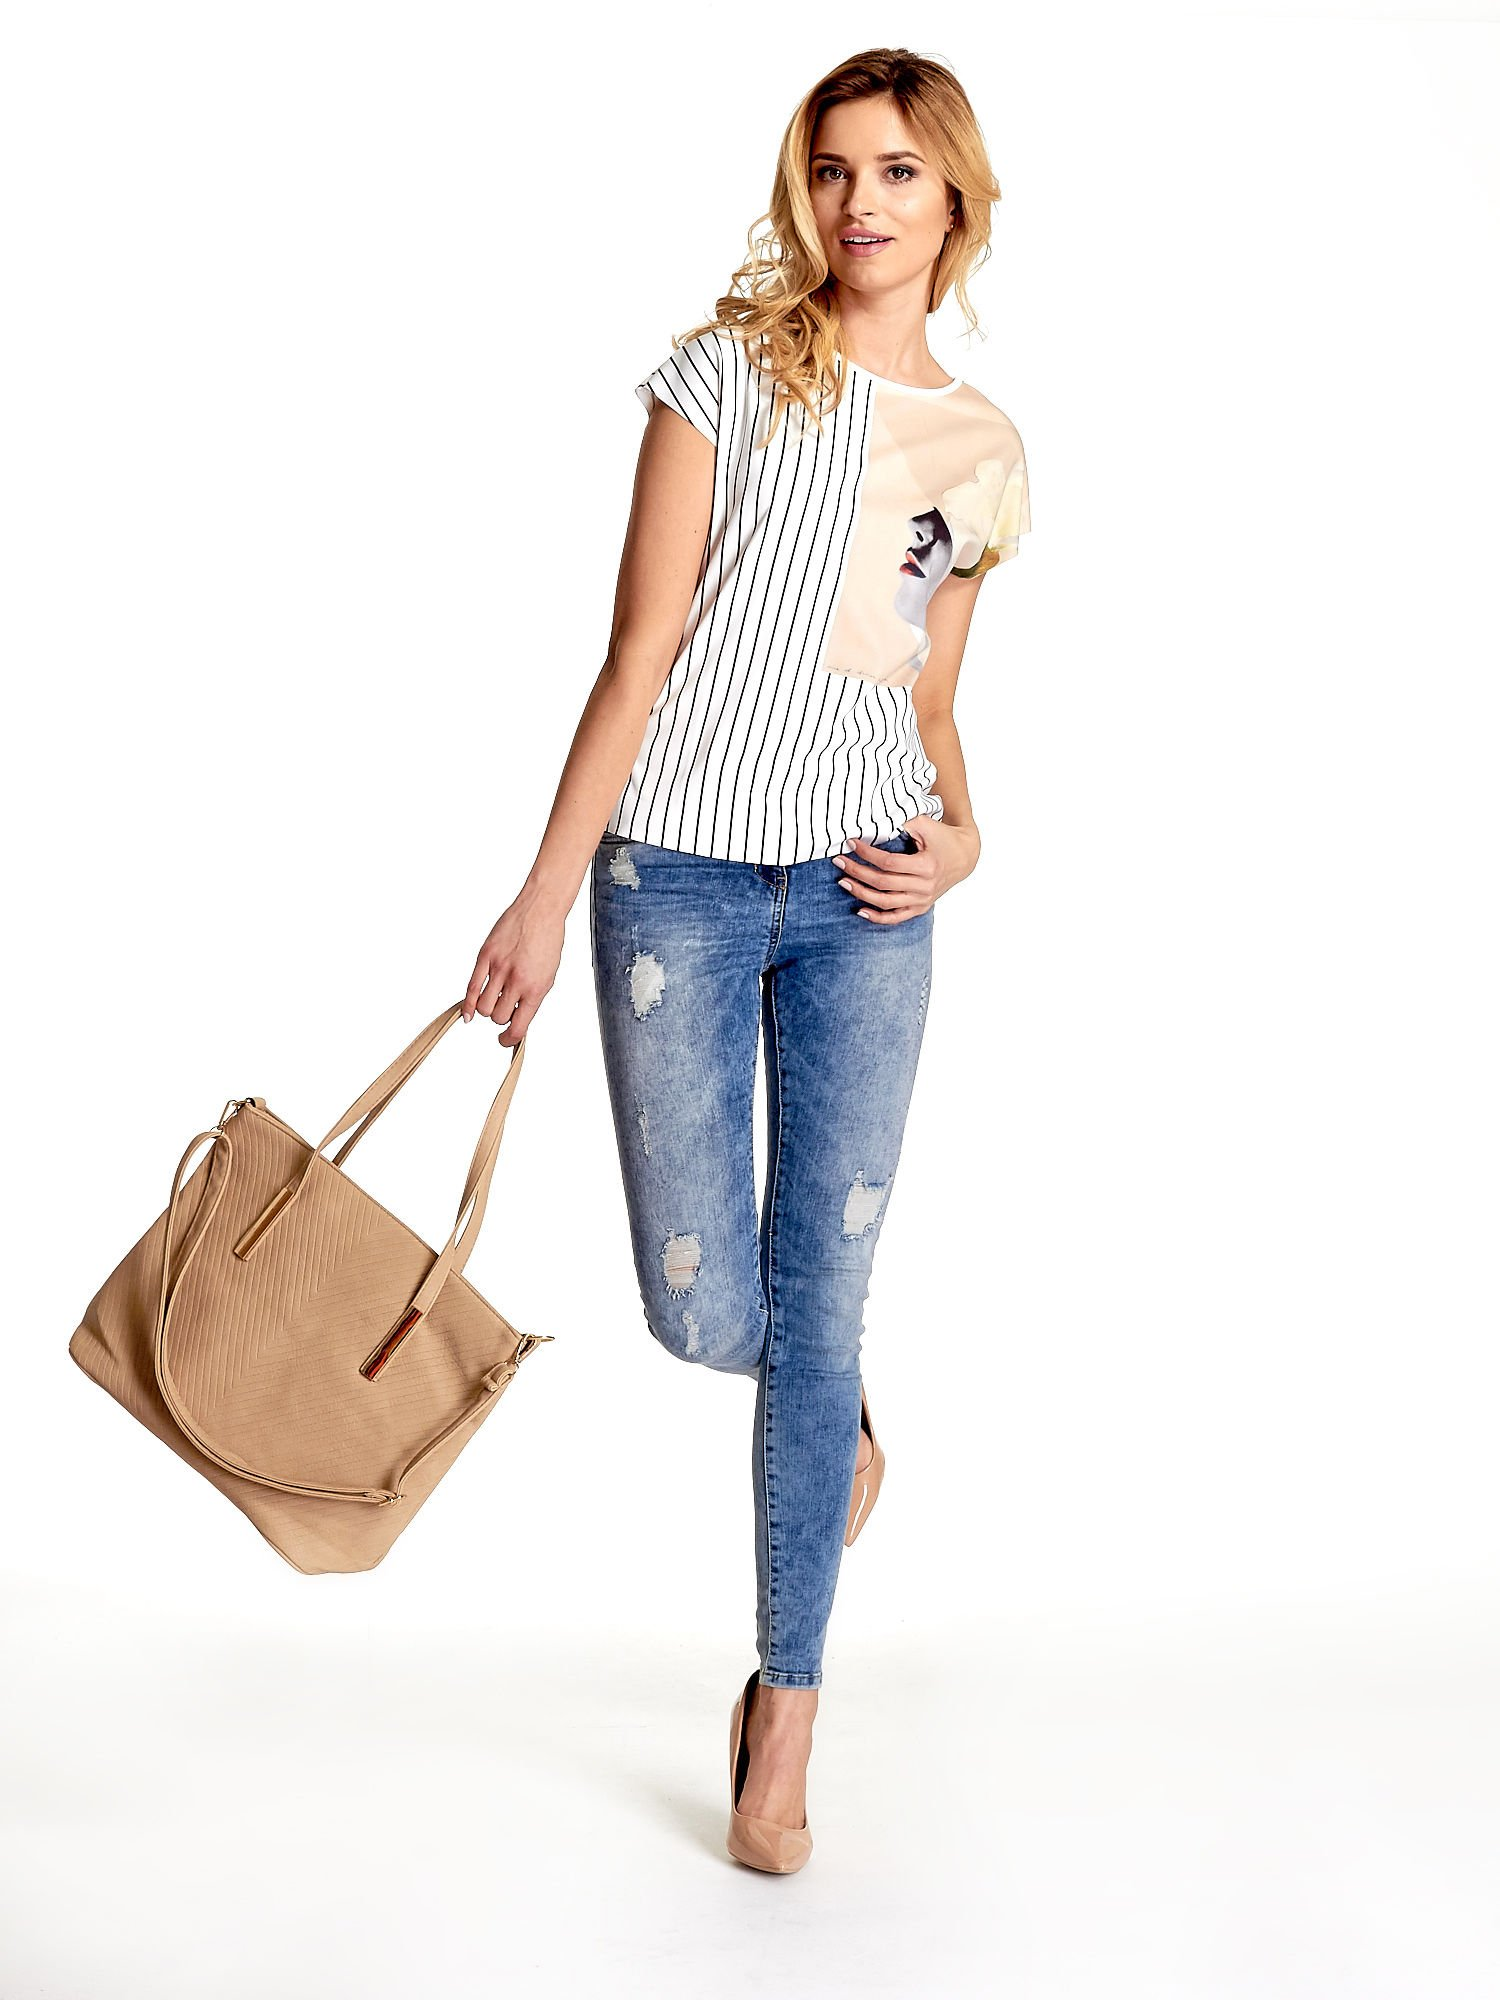 Beżowa fakturowana torba shopper bag                                  zdj.                                  2